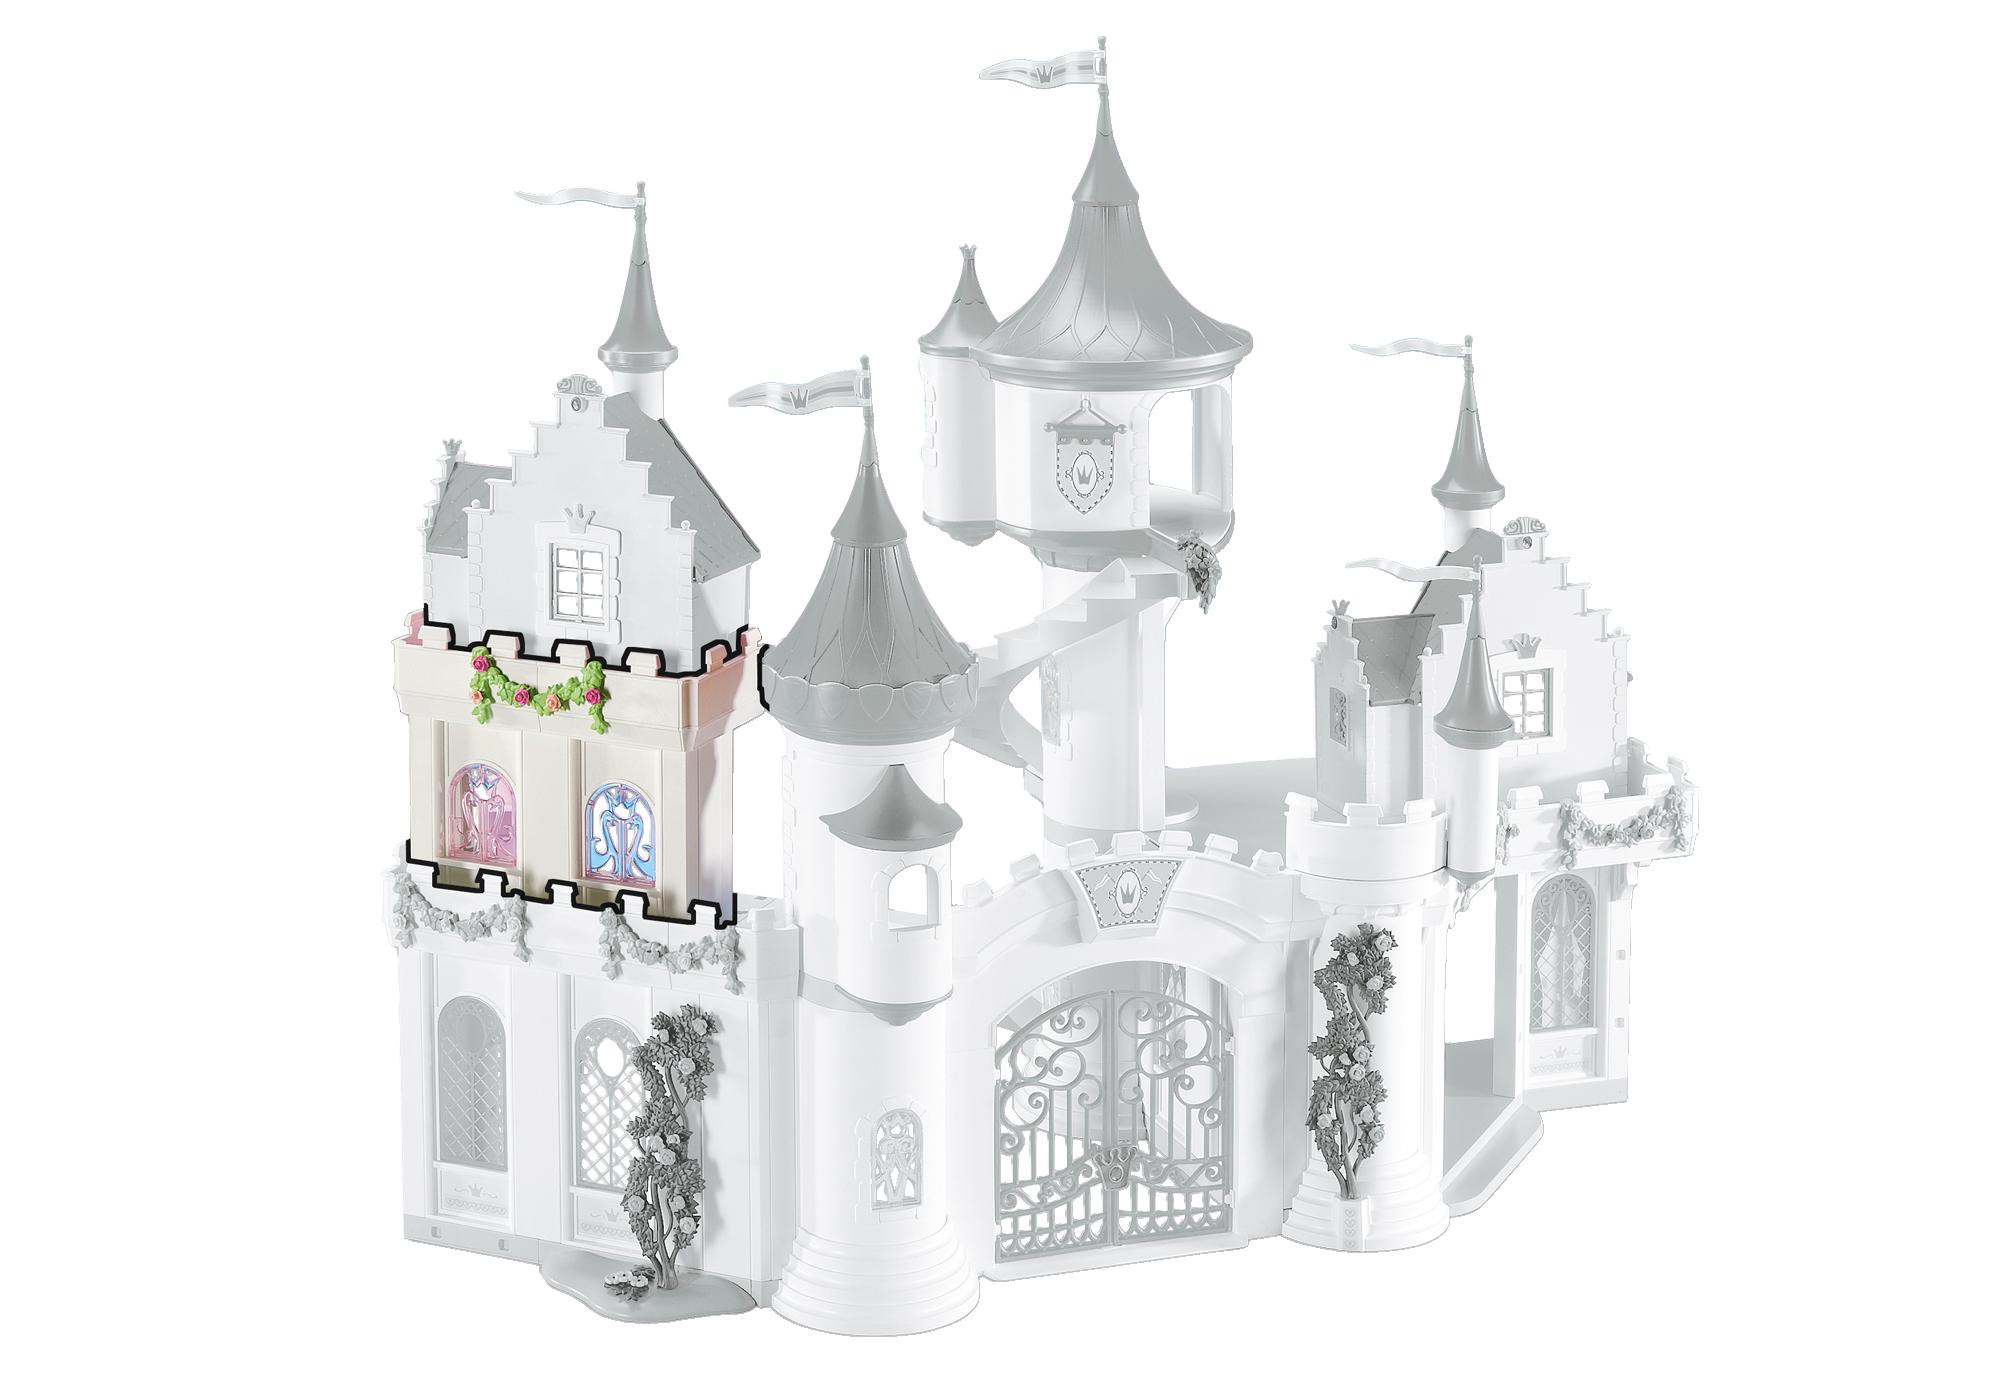 http://media.playmobil.com/i/playmobil/6518_product_detail/Princess Castle Extension A